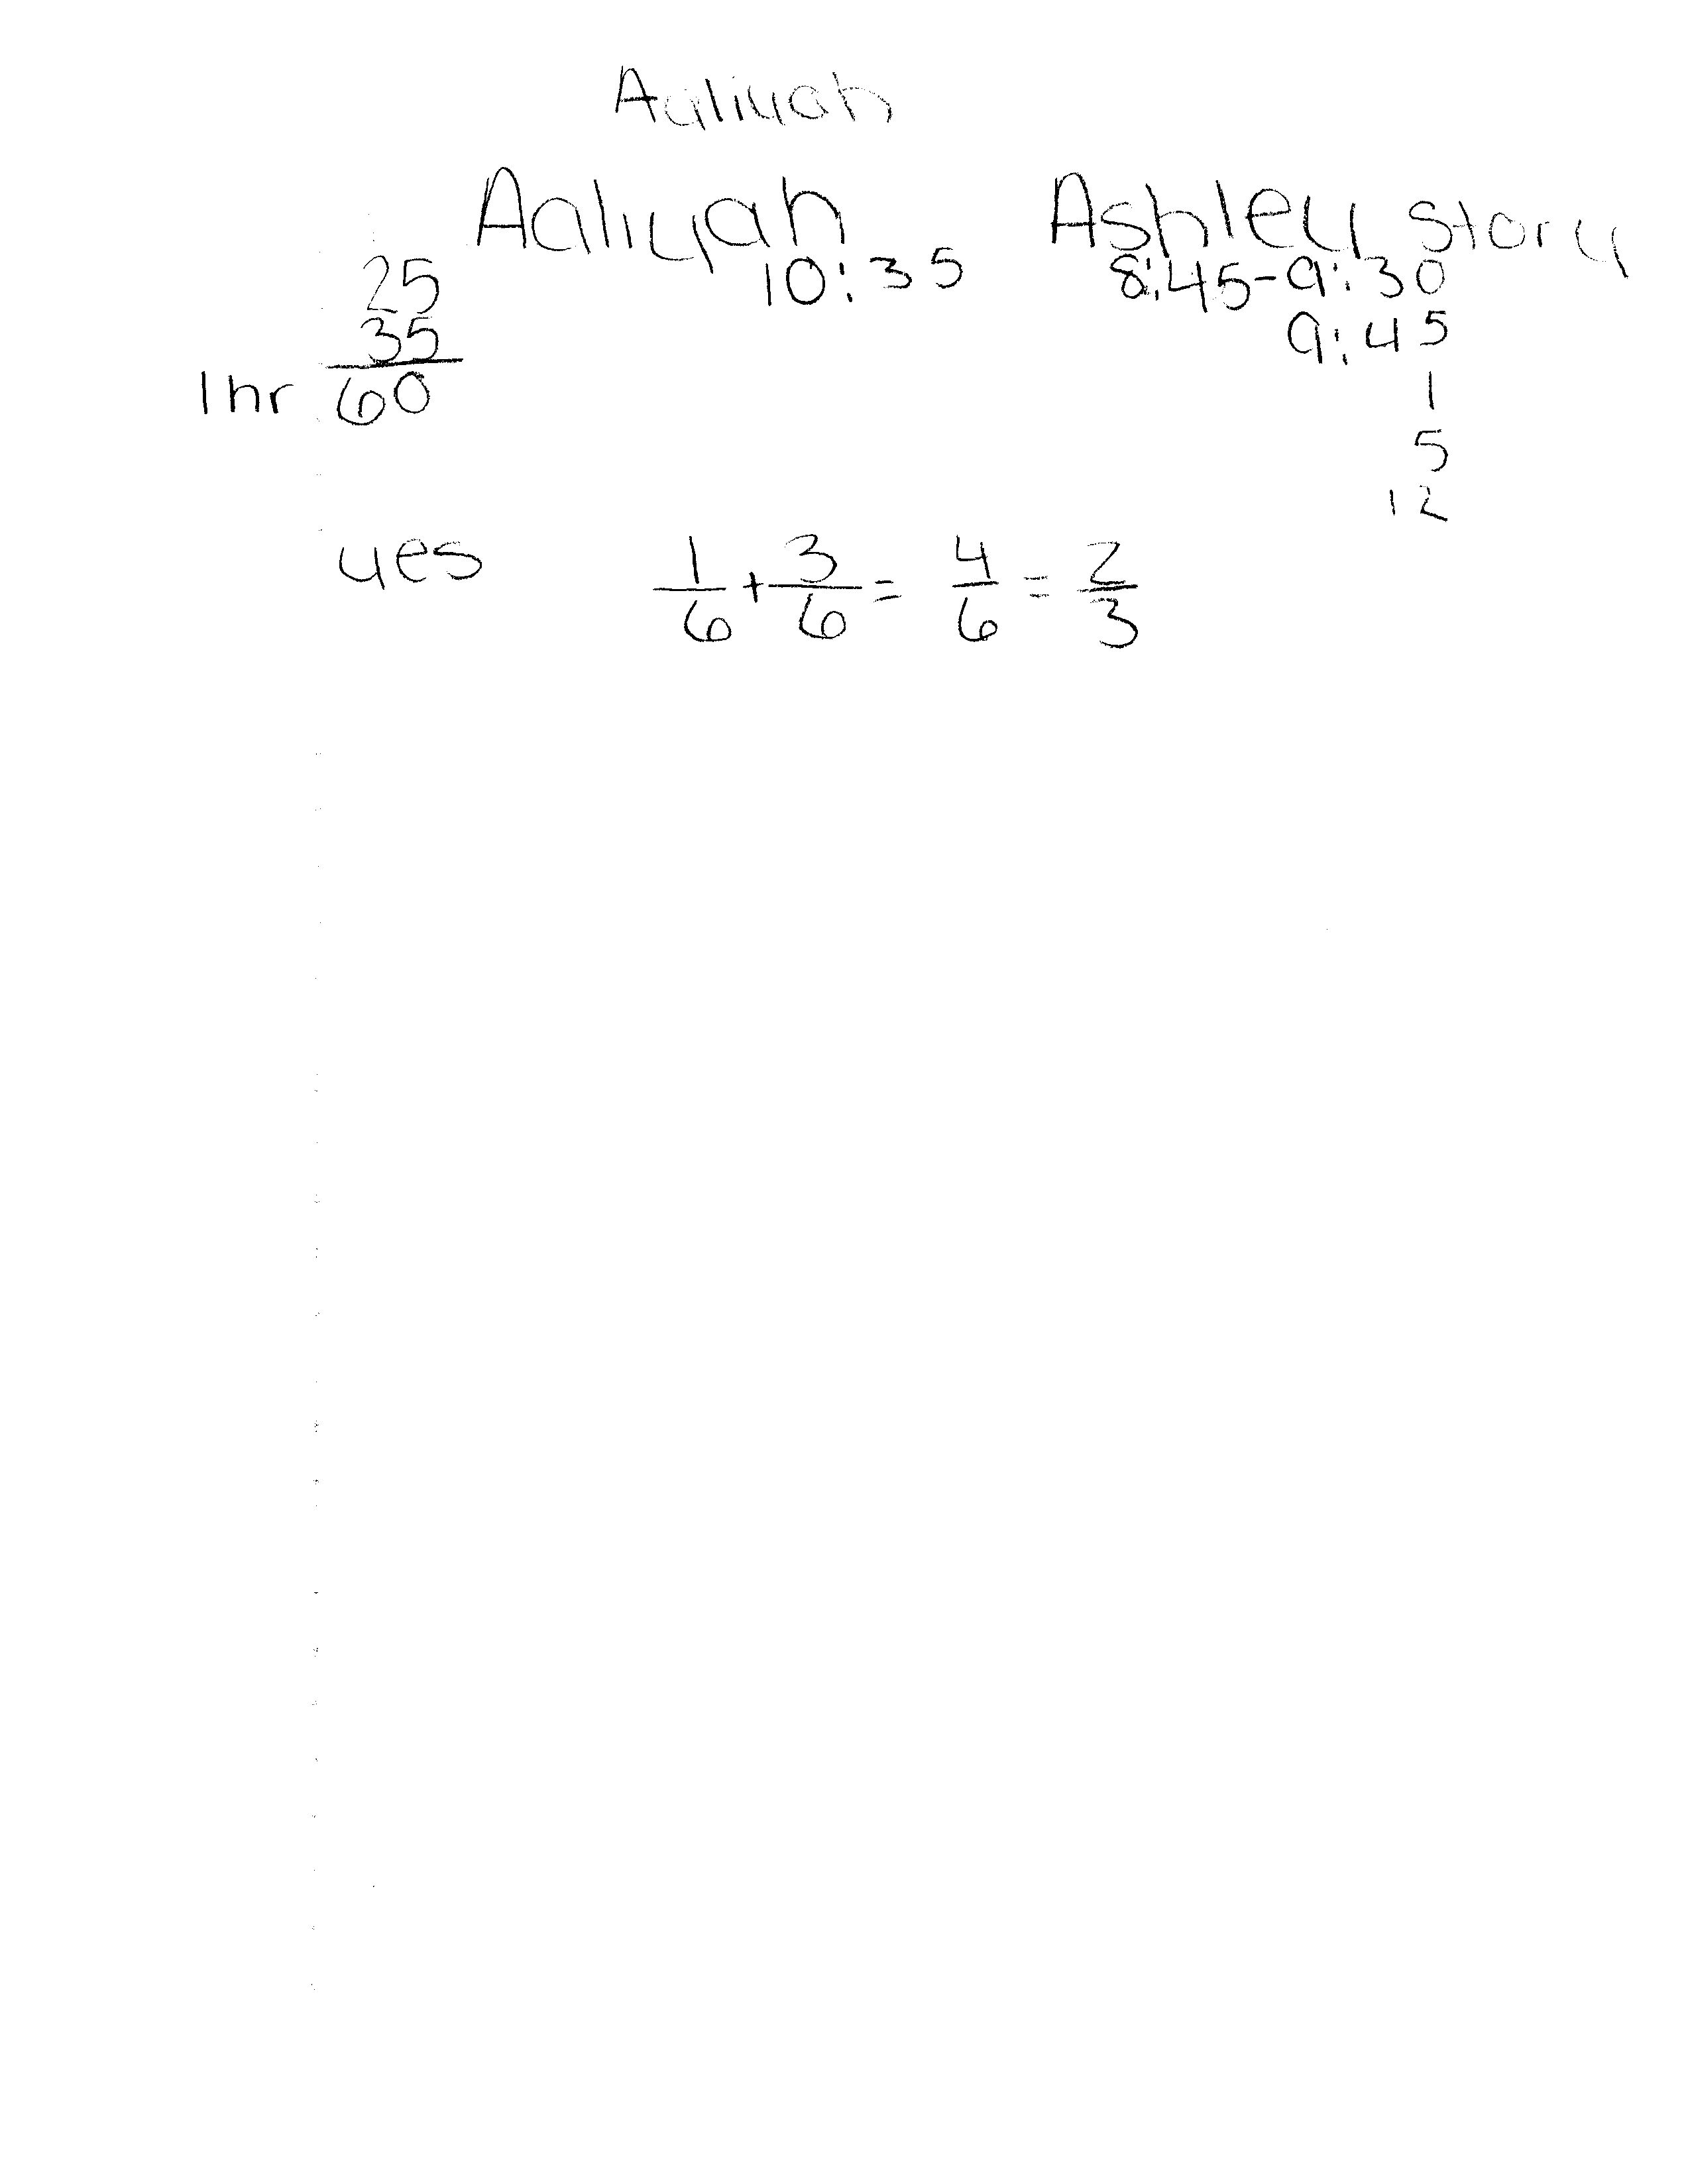 math worksheet : wvsu lesson plan : Math Curse Worksheets